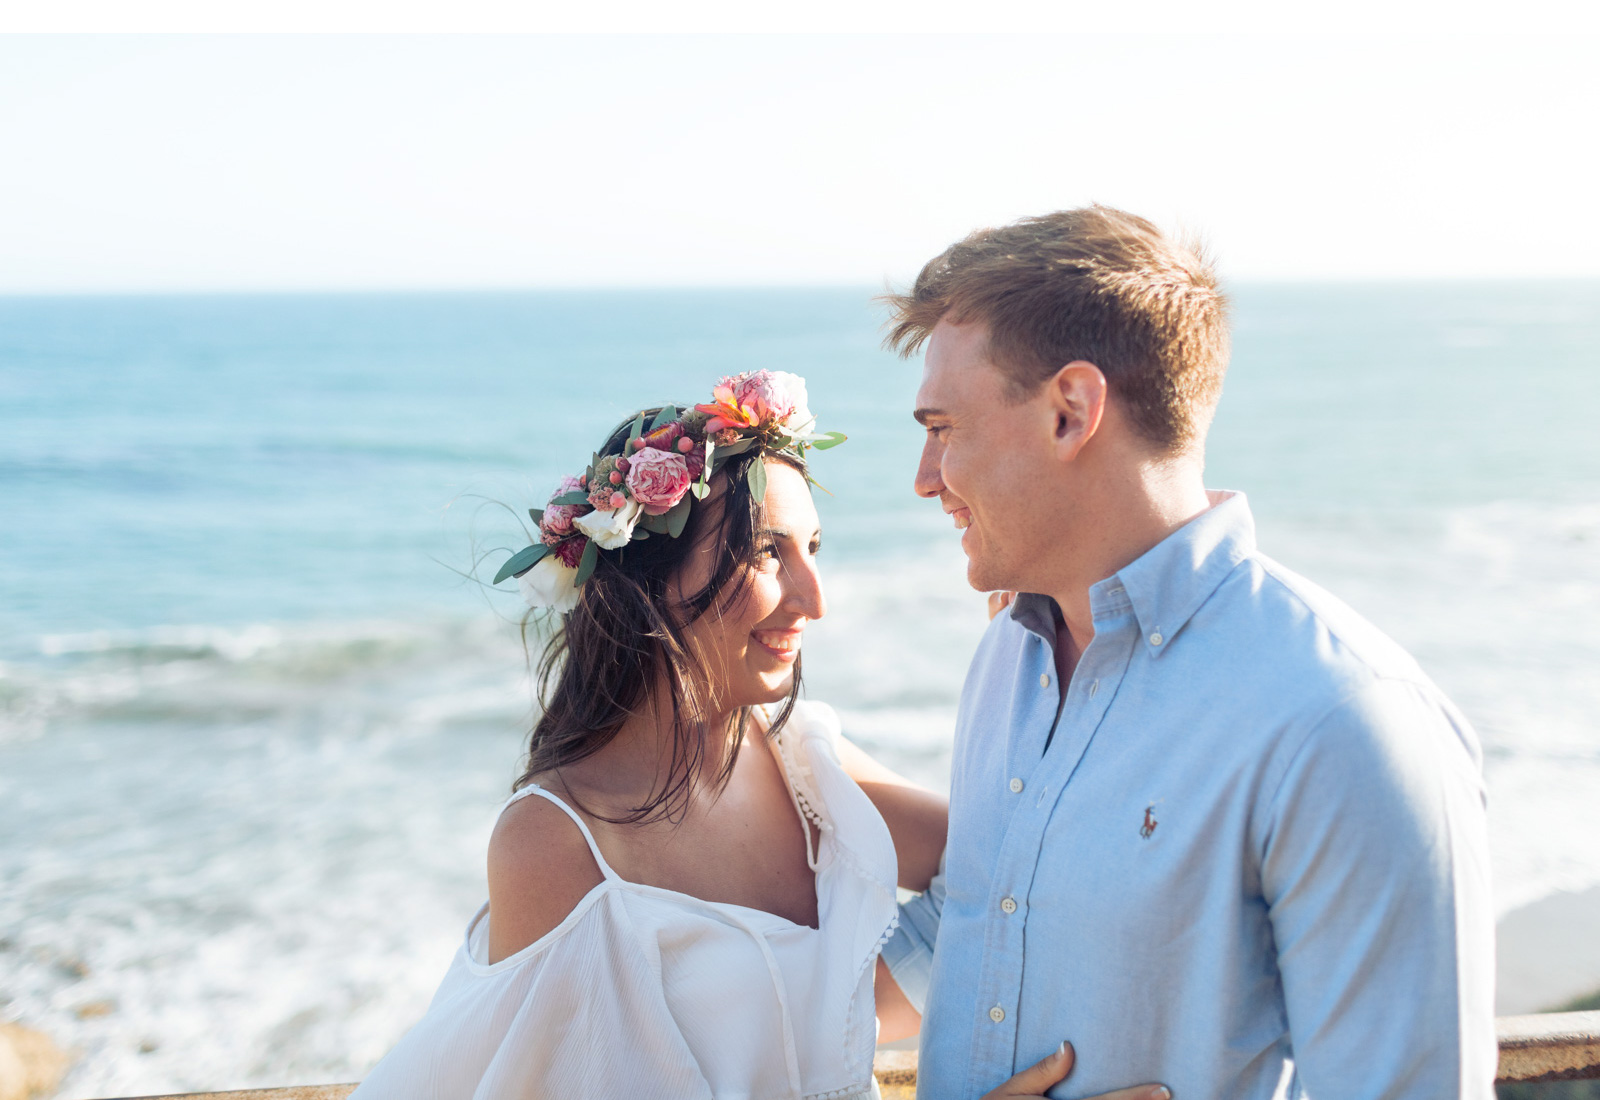 San-Luis-Obispo-Wedding-Photographer-Natalie-Schutt-Photography_13.jpg